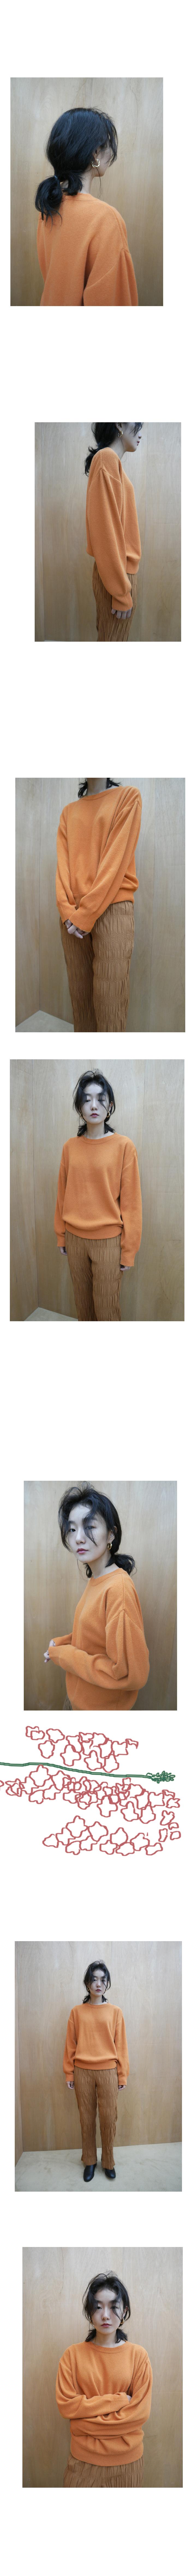 vivid color round knit